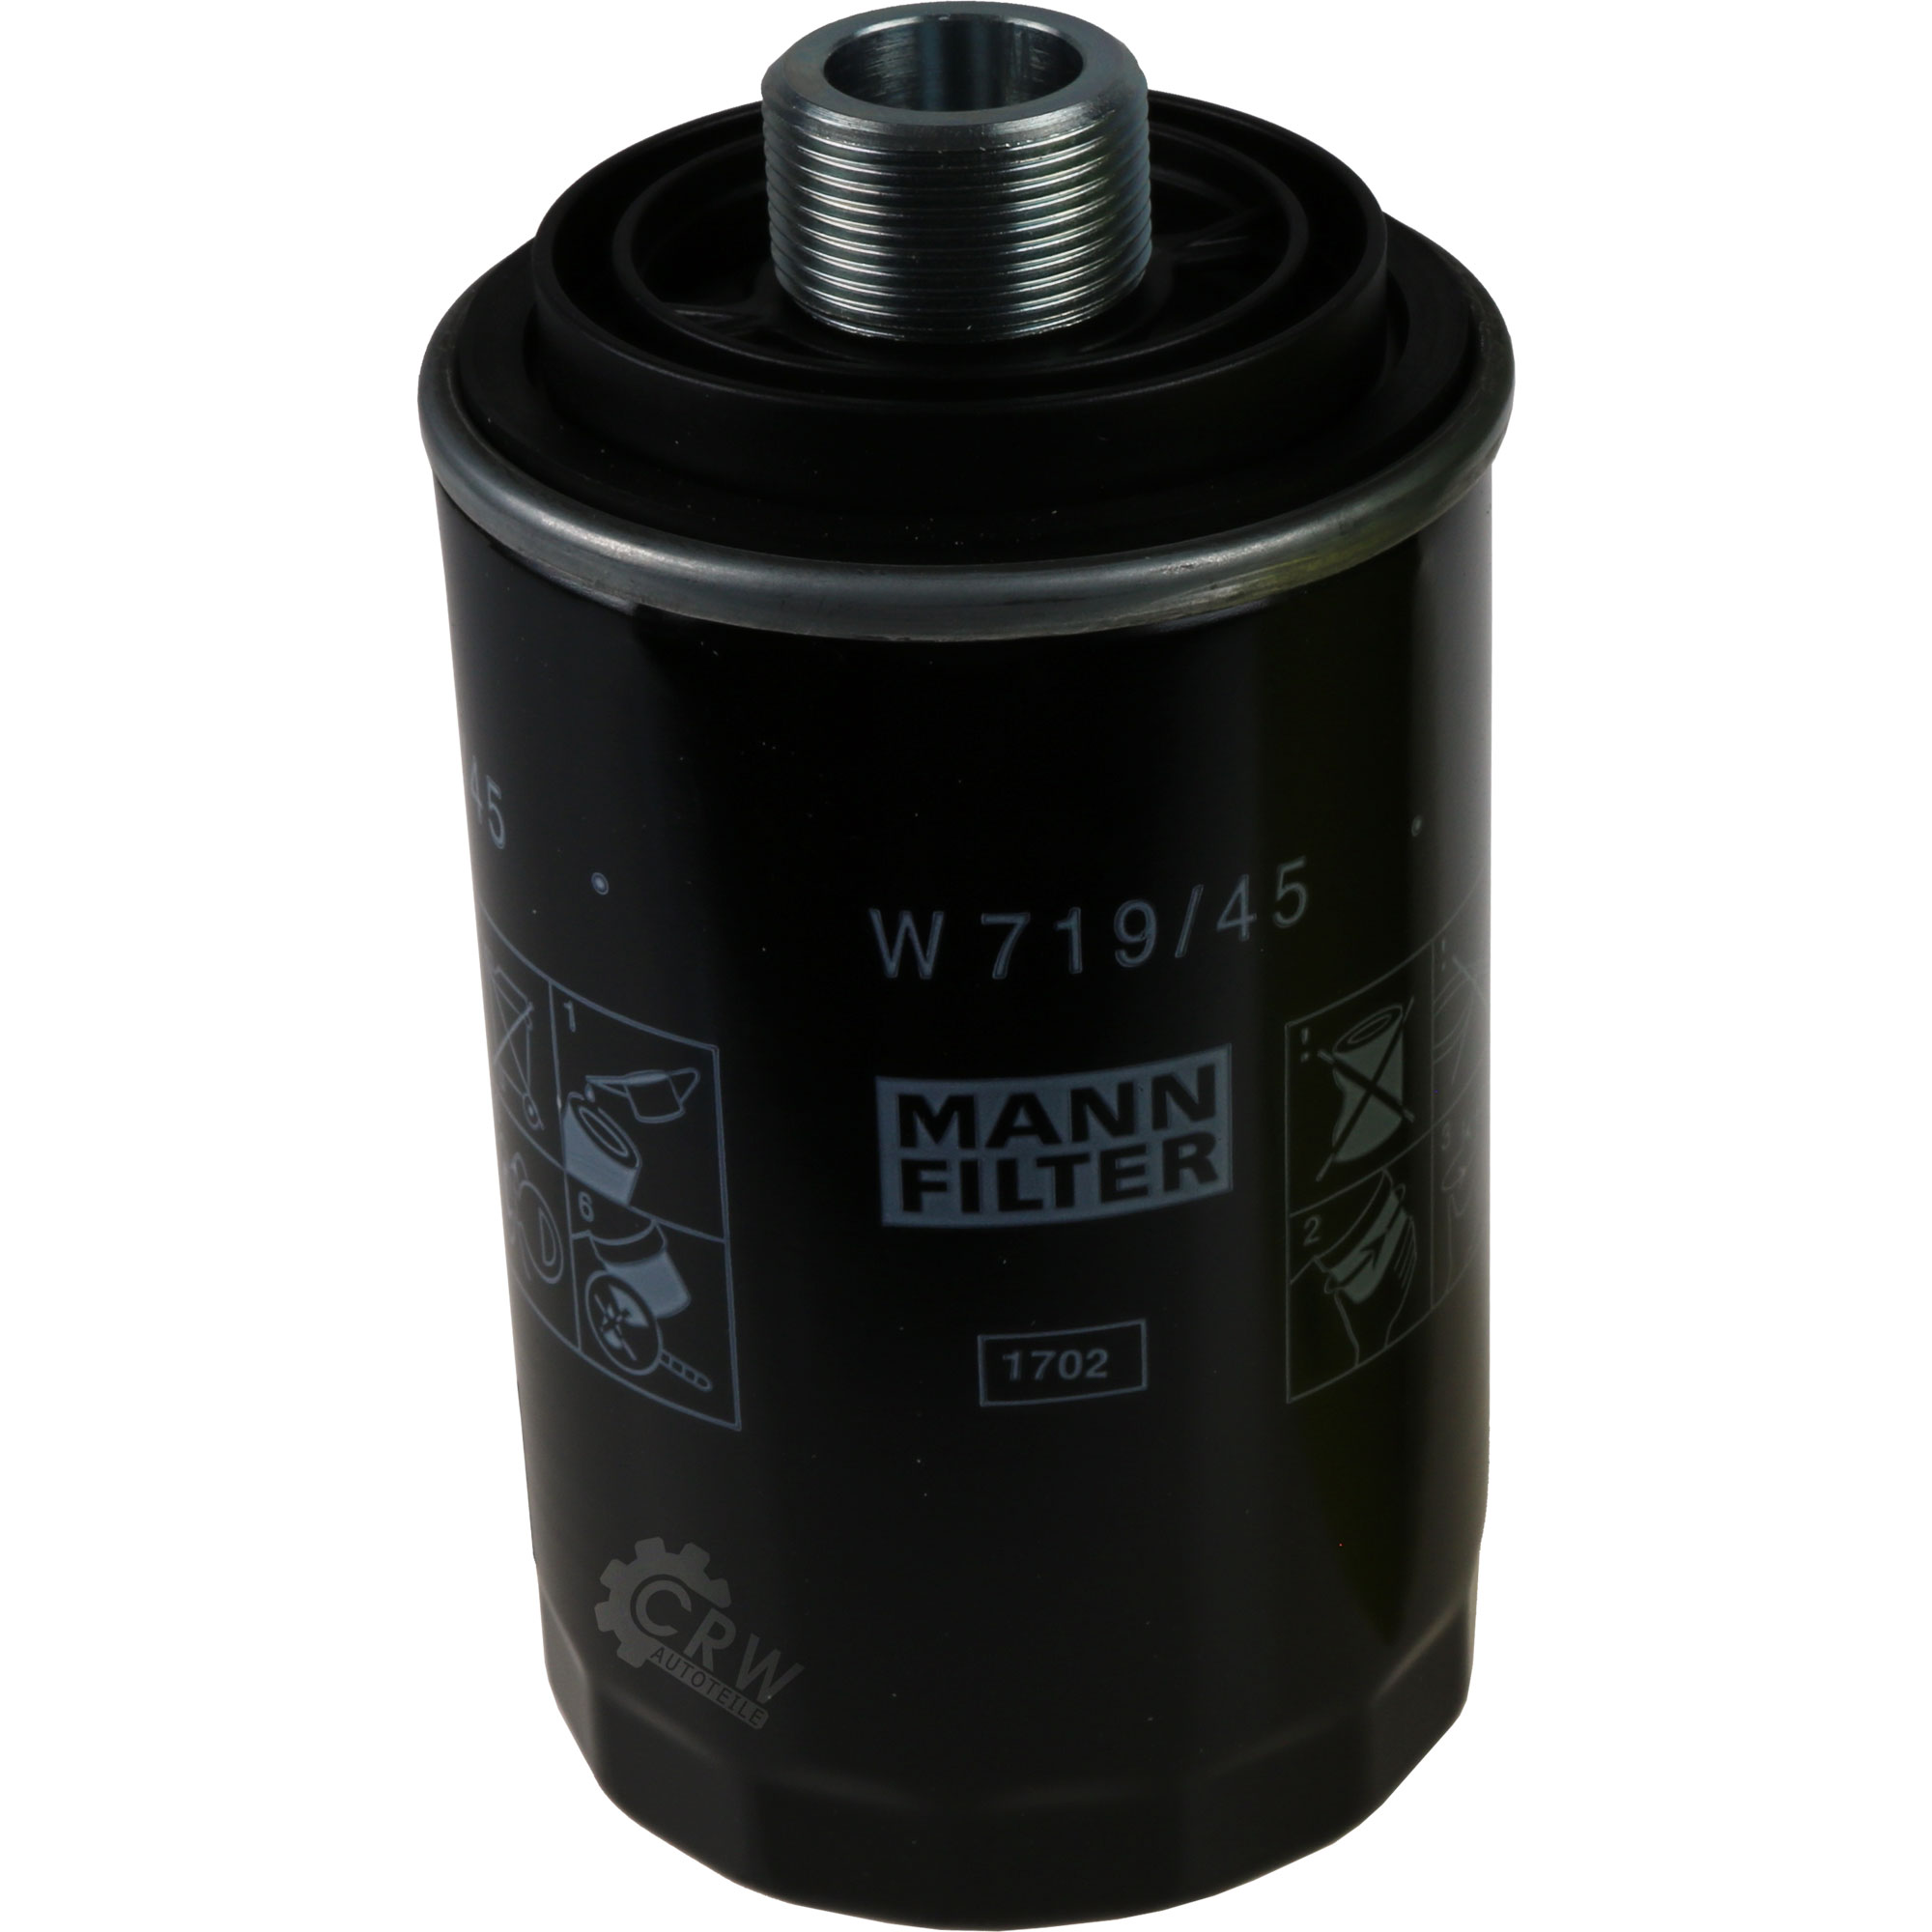 MANNOL-5-l-energy-premium-5w-30-Mann-Filter-skoda-superb-3t4-1-8-ETI-4x4 miniatura 9